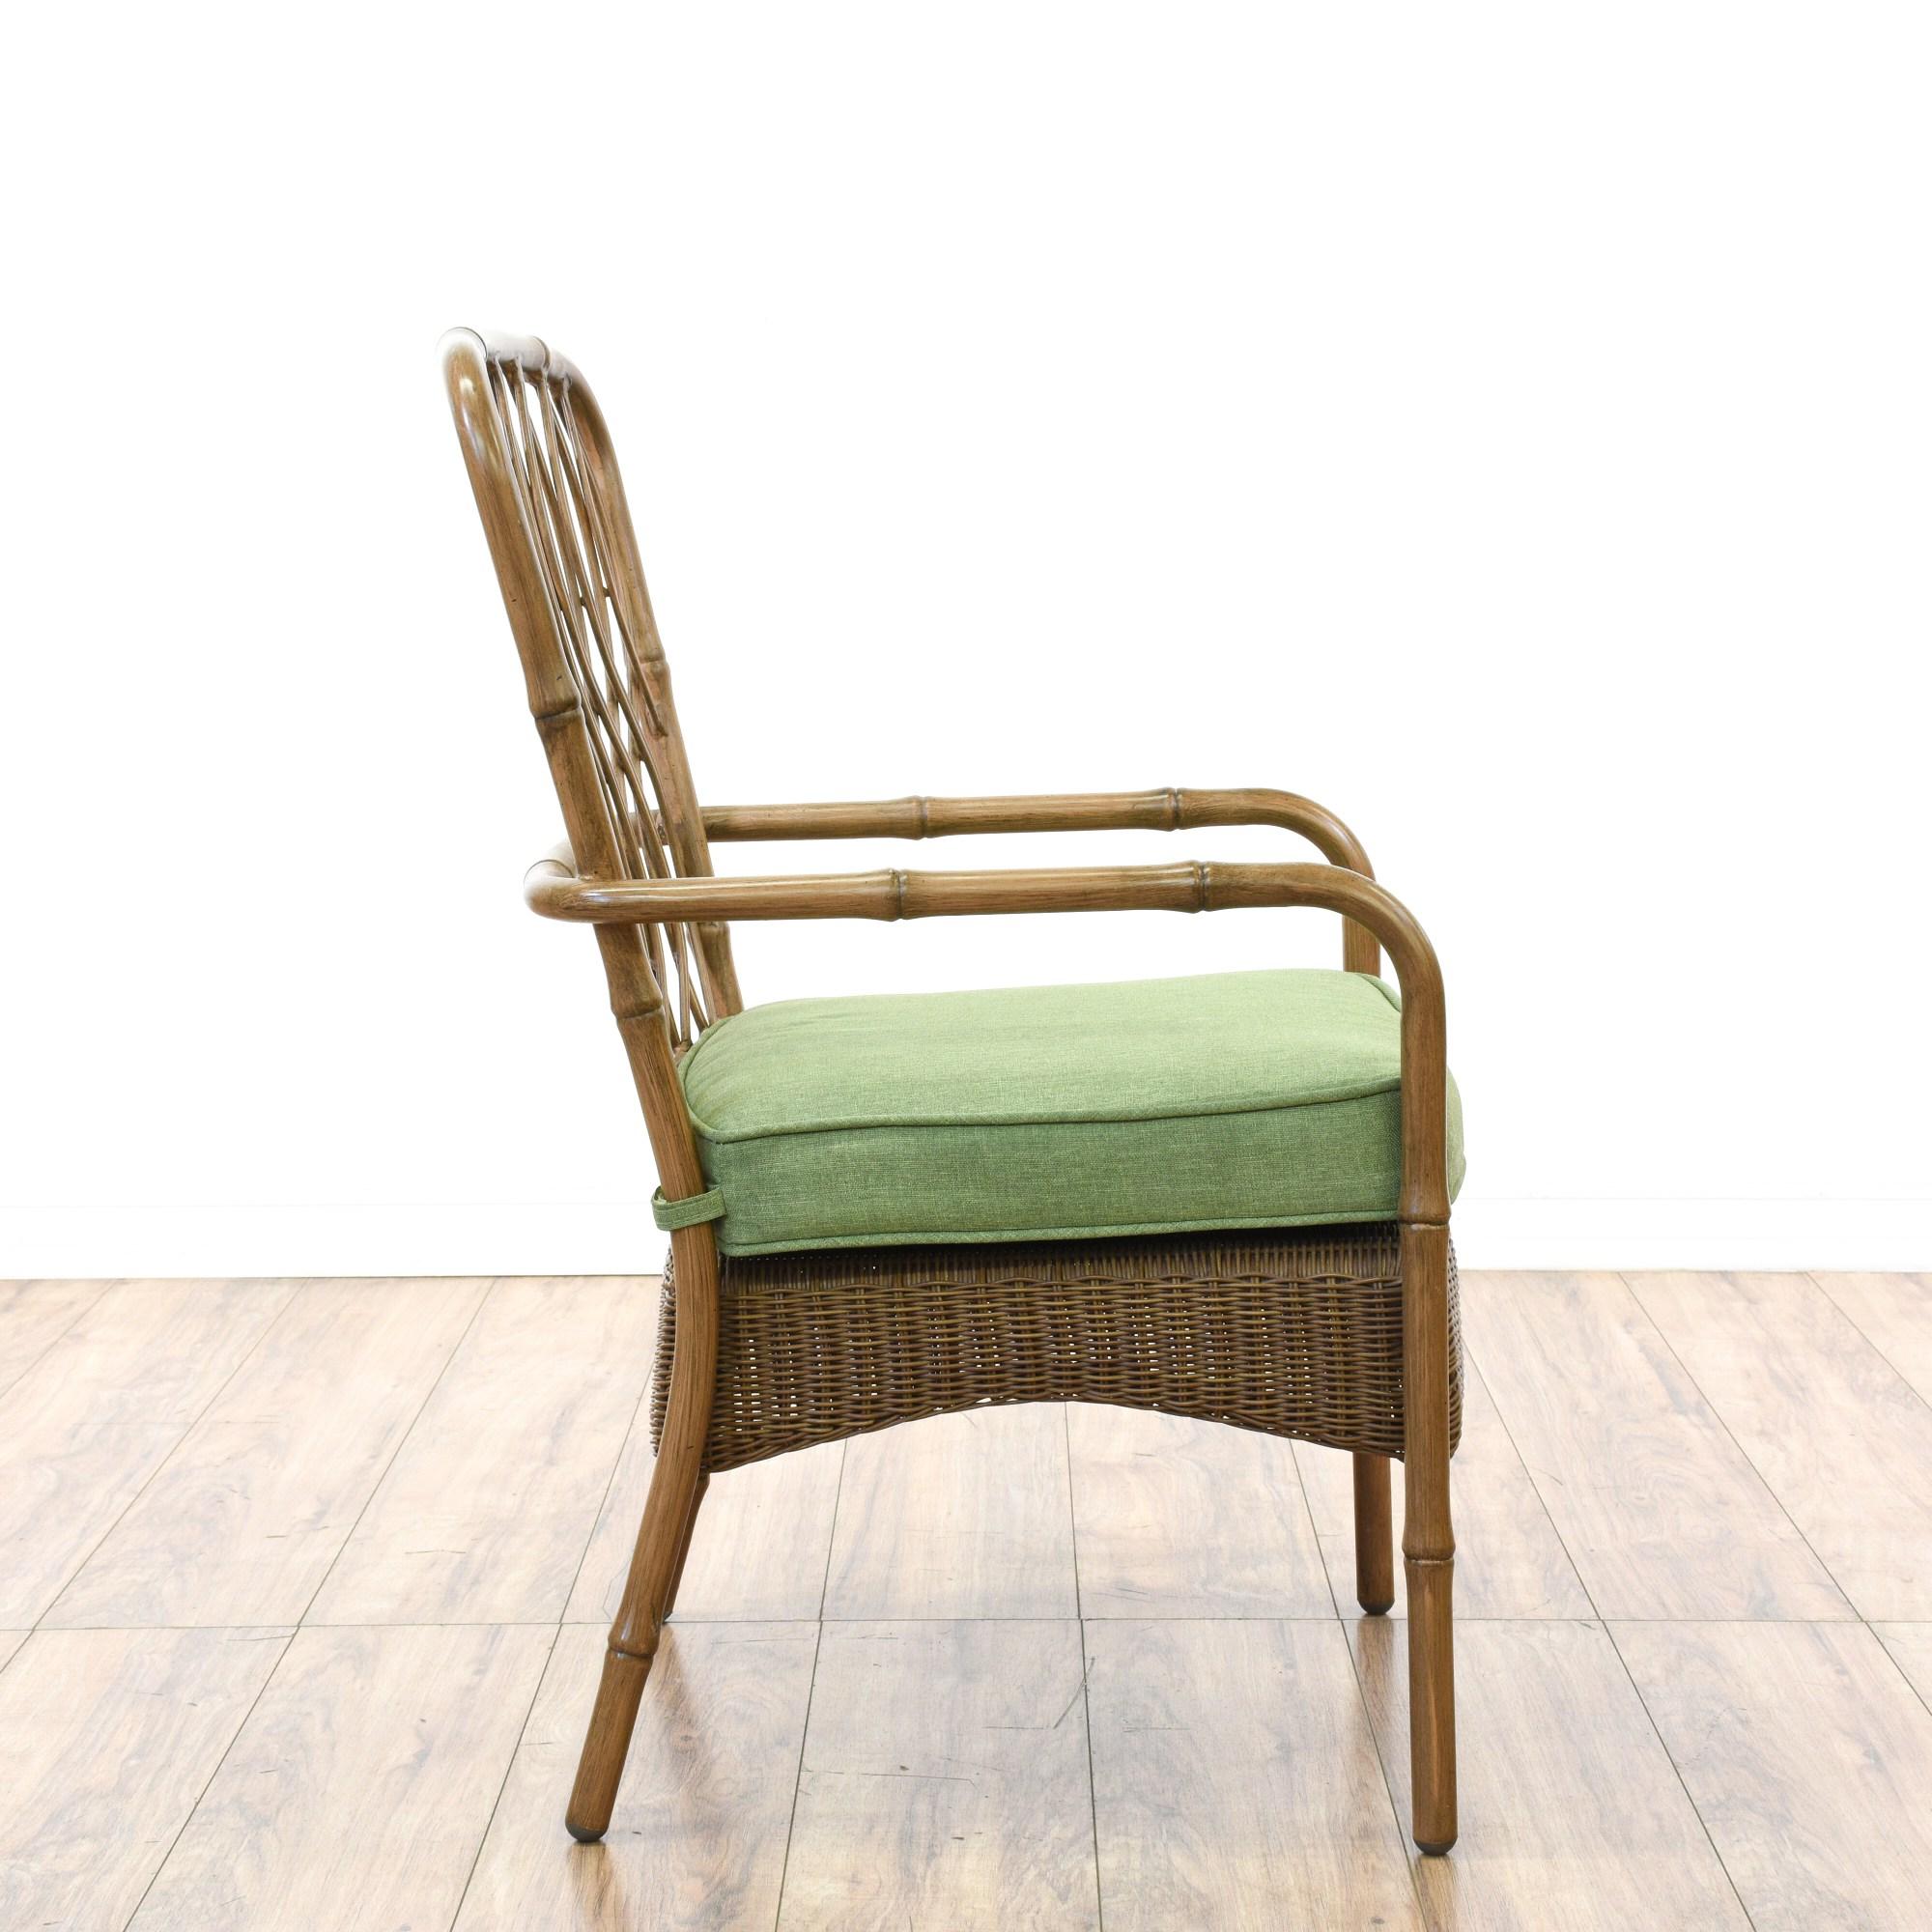 Set of 4 Hampton Bay Wicker  Metal Patio Chairs